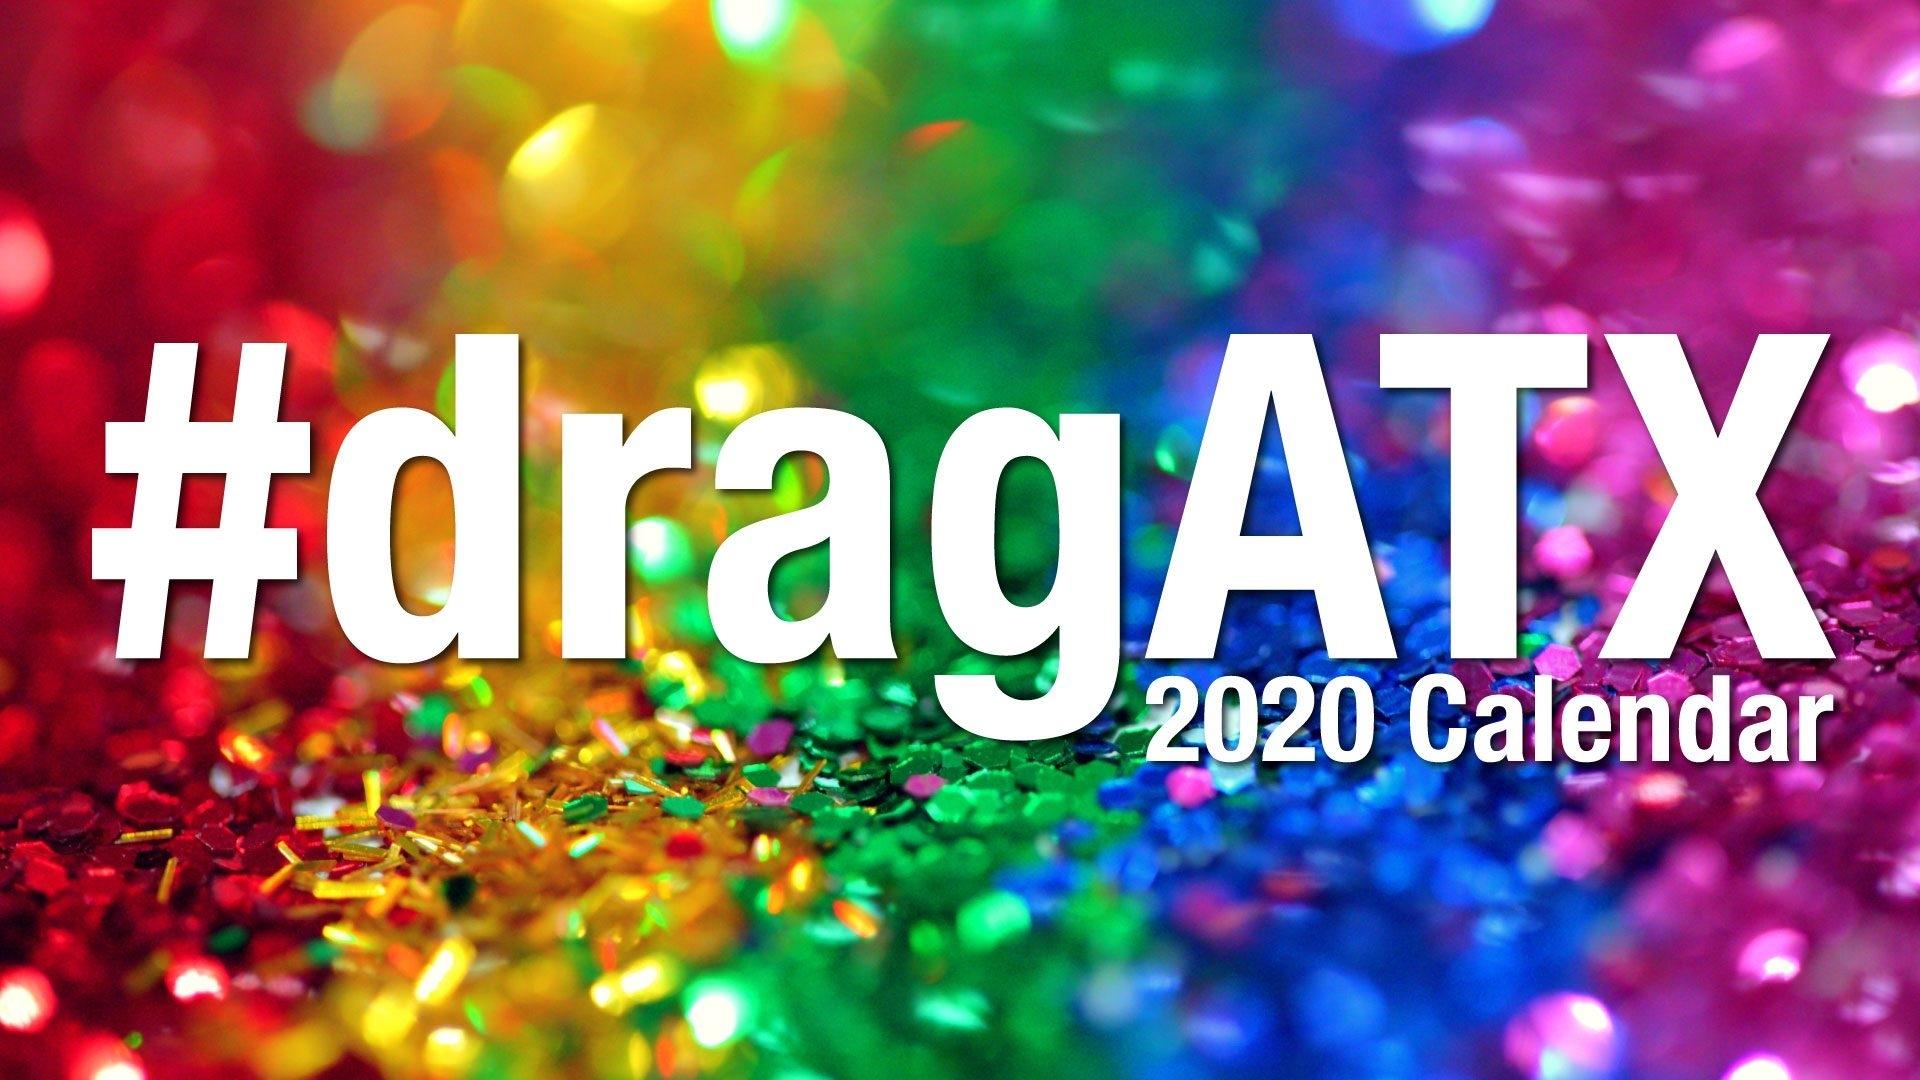 Dragatx 2020 Calendar - Therepubliq for Stephen F Austin 2019 2020 Calendar